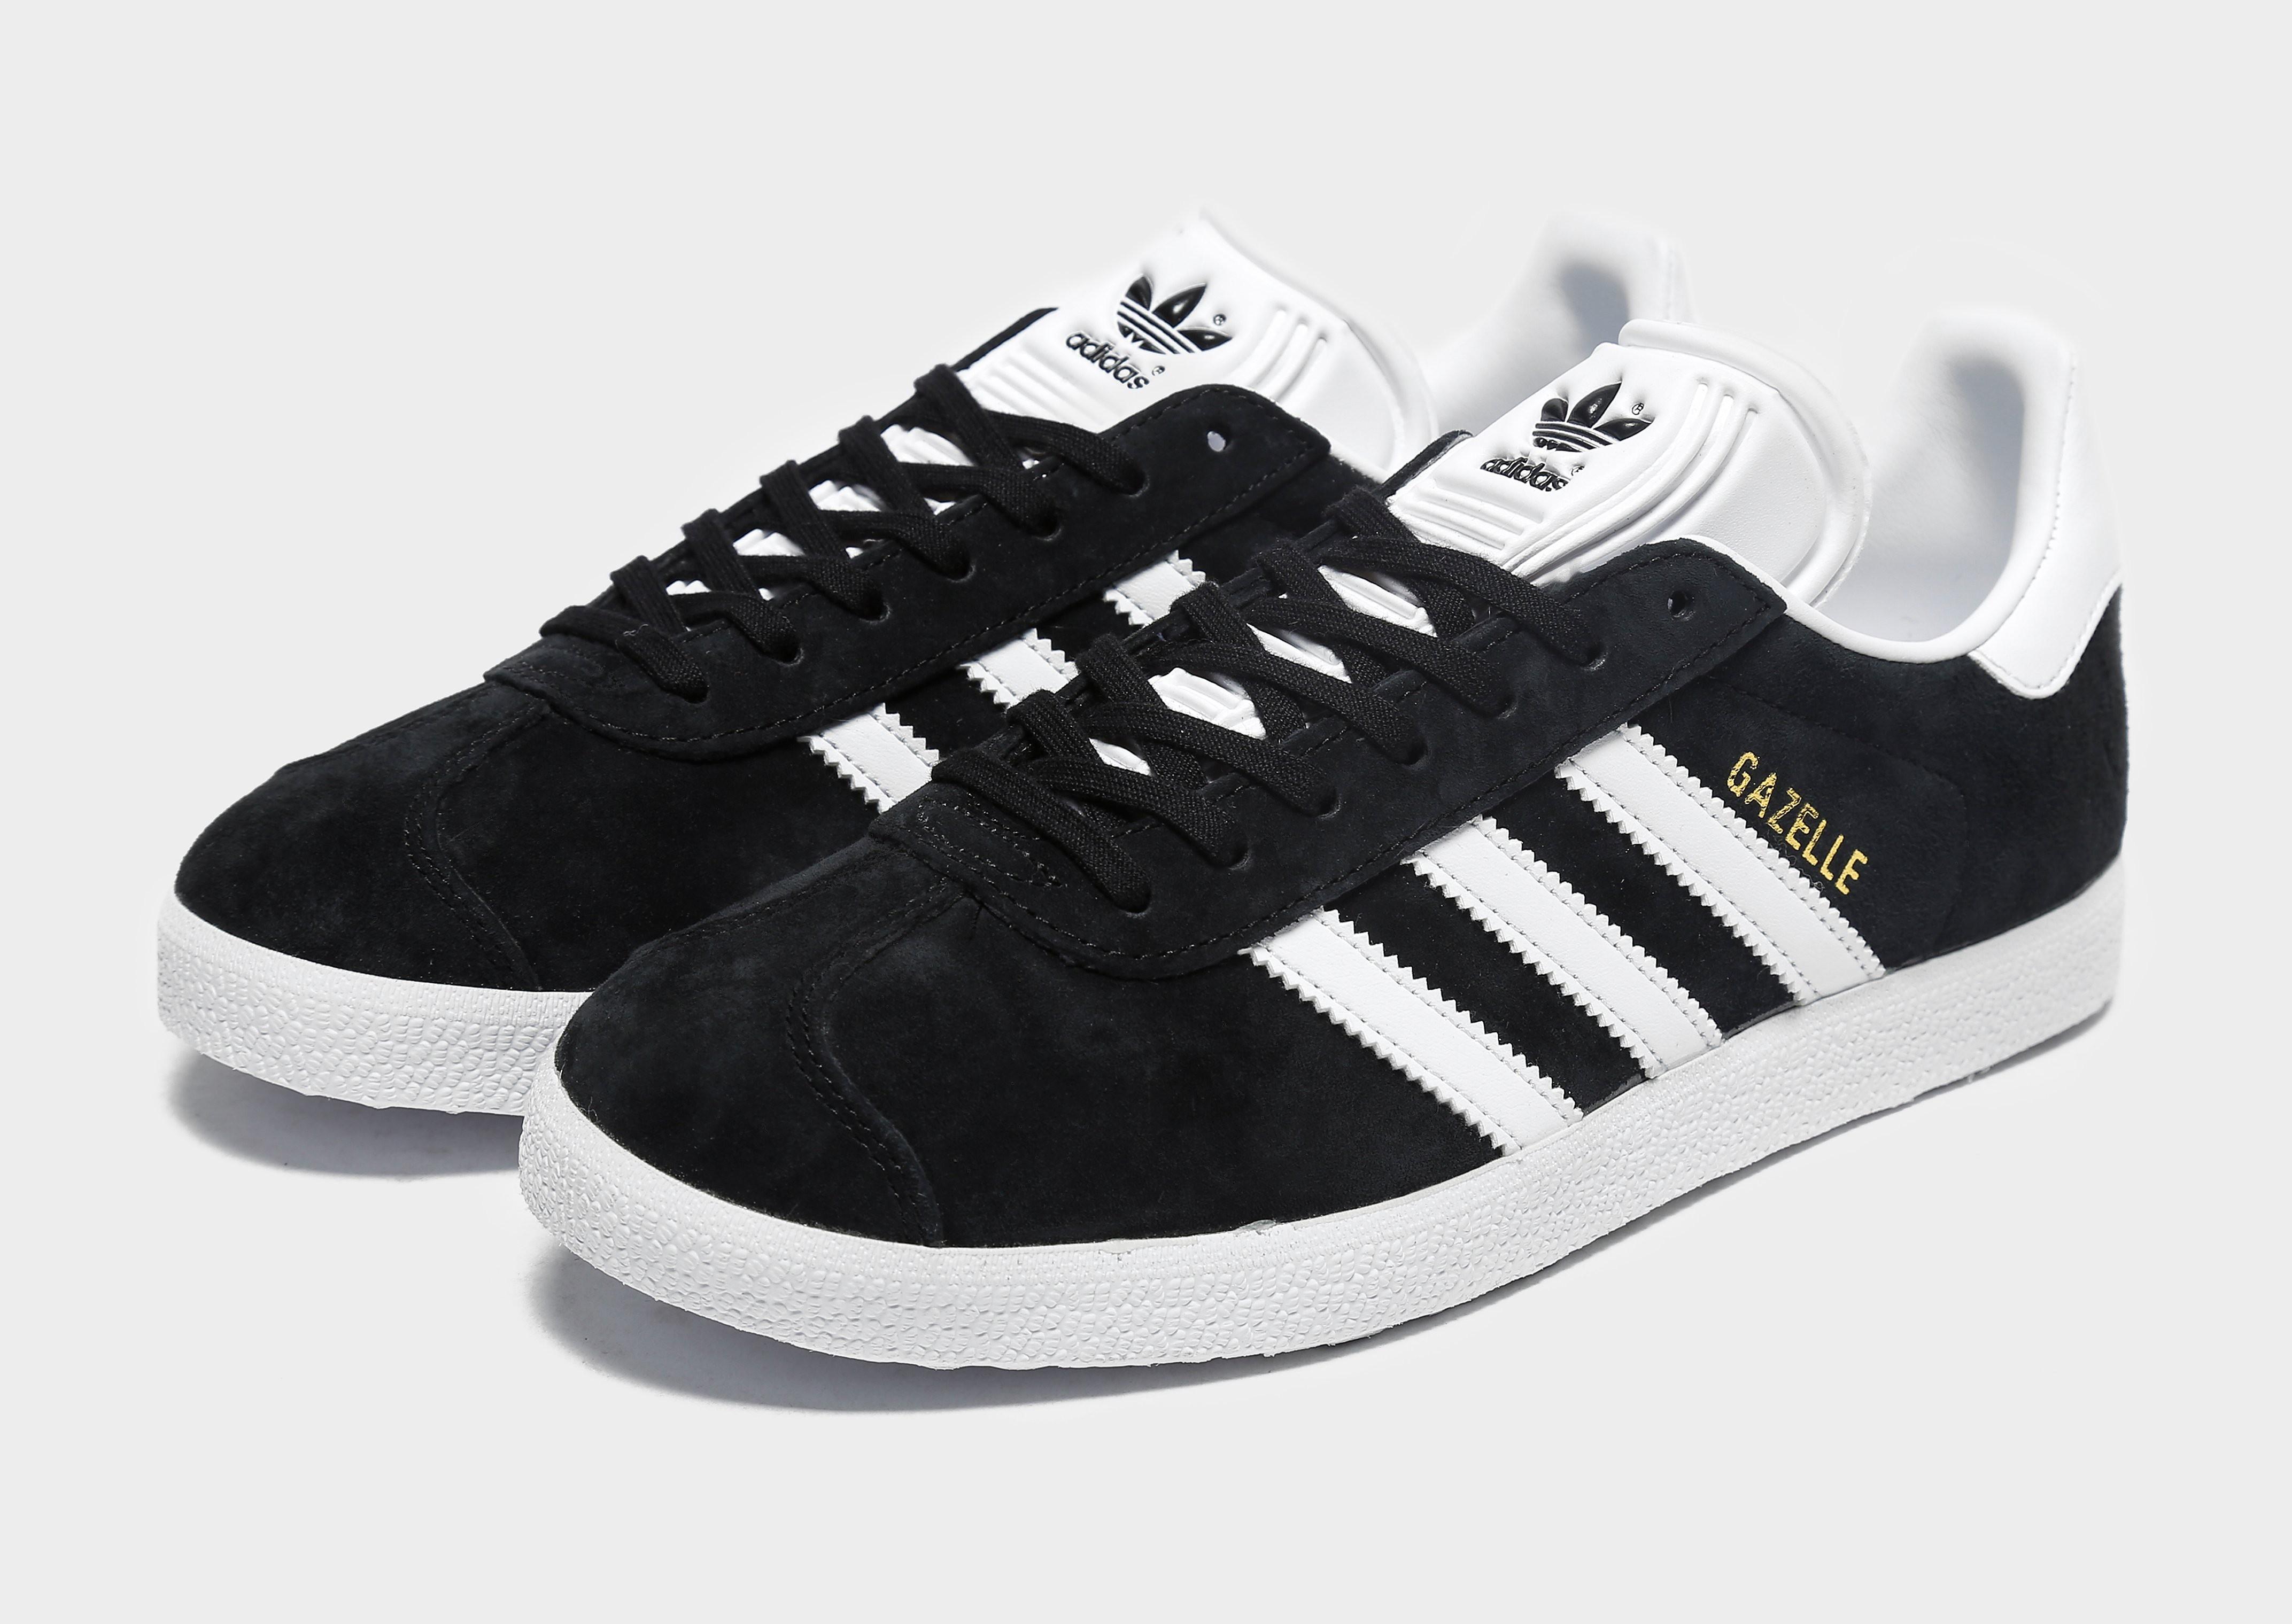 Women S Adidas Gazelle Adidas Originals Footwear Jd Sports